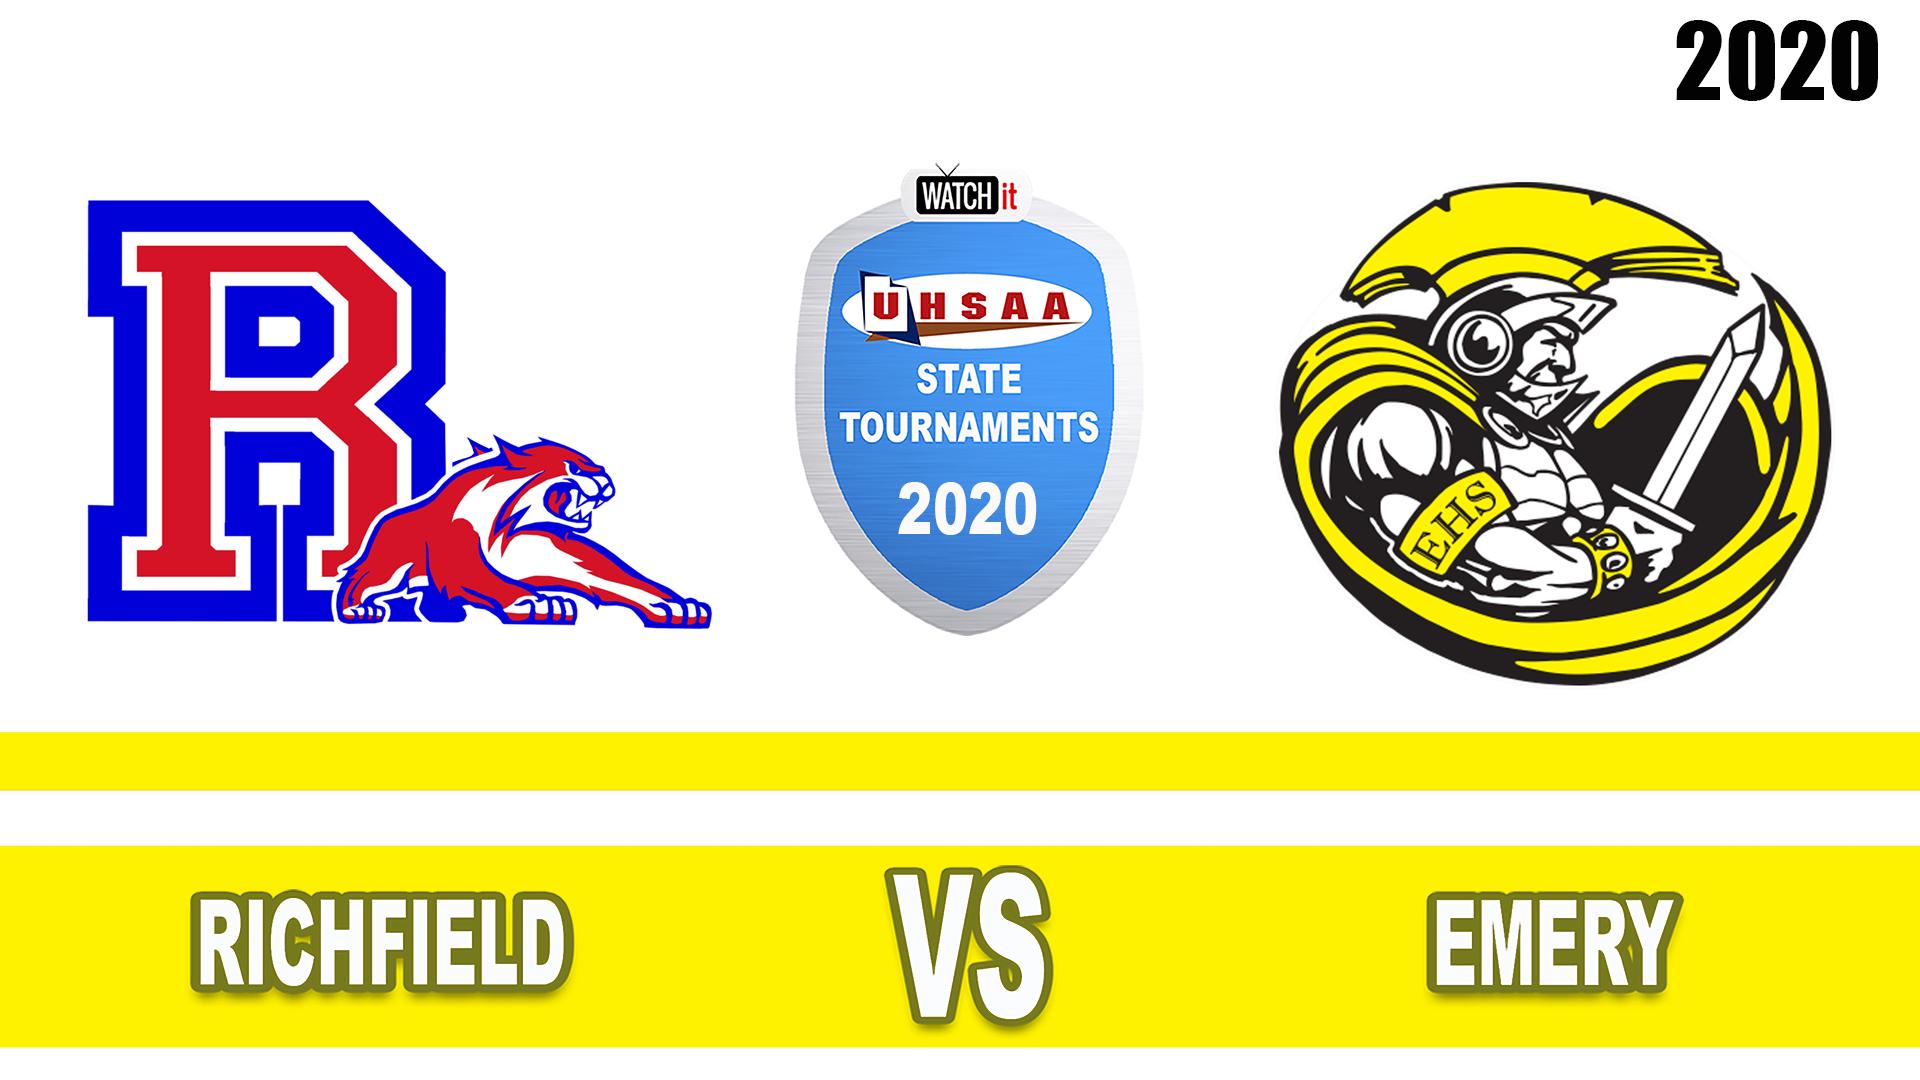 Richfield vs Emery